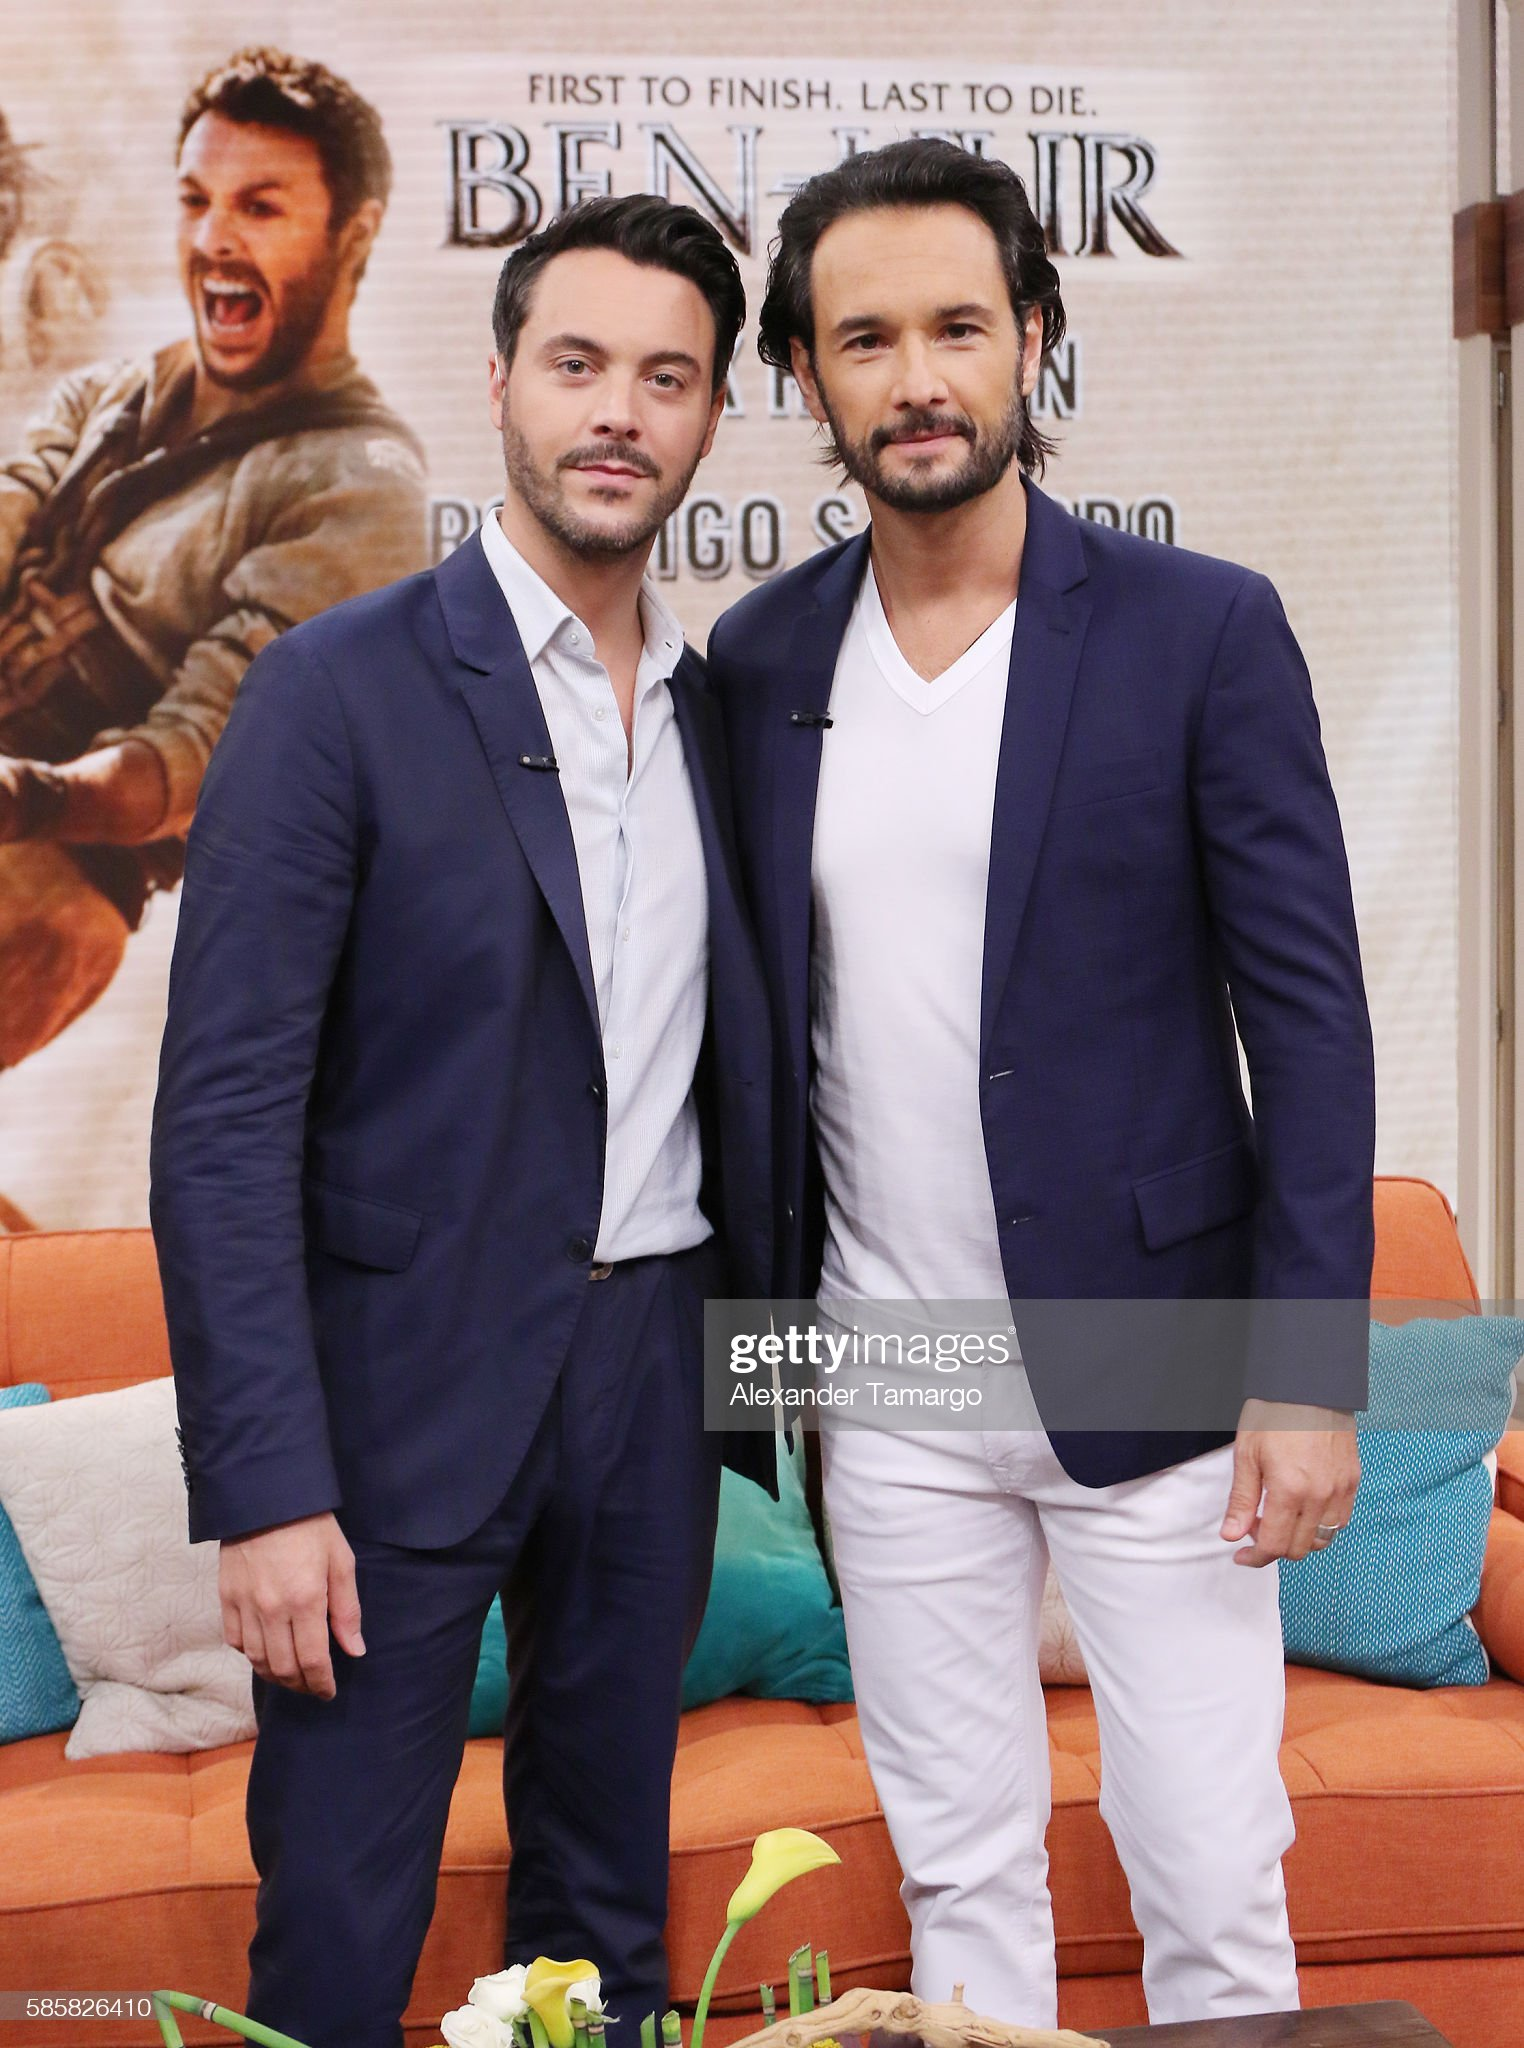 ¿Cuánto mide Rodrigo Santoro? - Altura - Real height Actors-jack-huston-and-rodrigo-santoro-are-seen-on-the-set-of-to-picture-id585826410?s=2048x2048